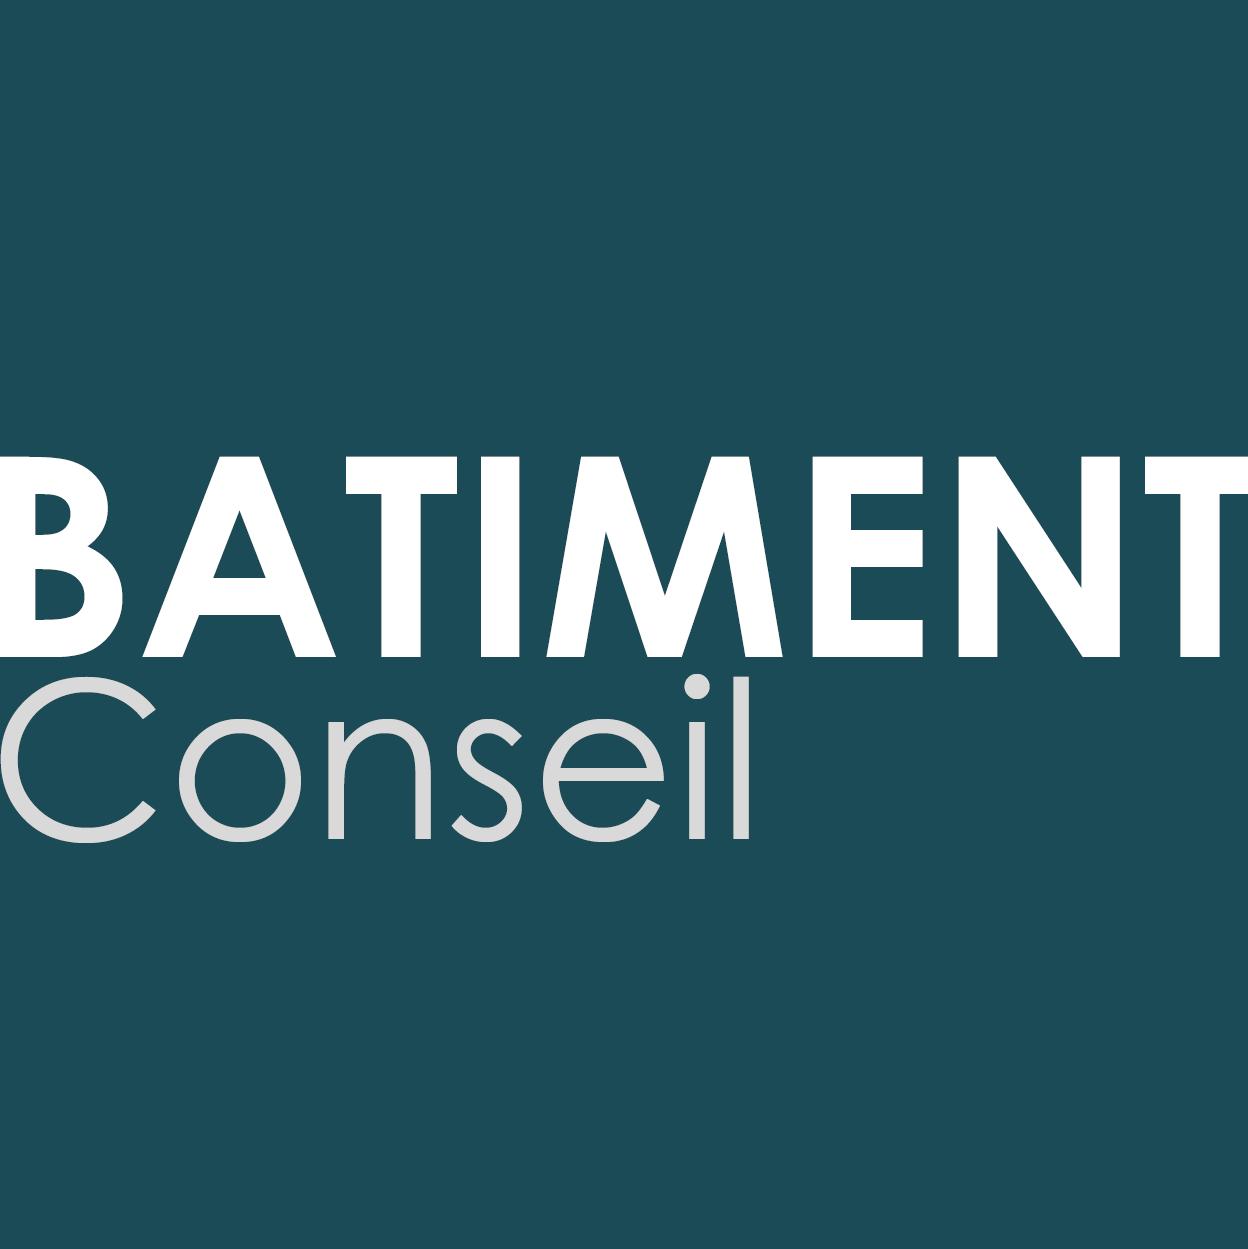 BATIMENT Conseil - logo